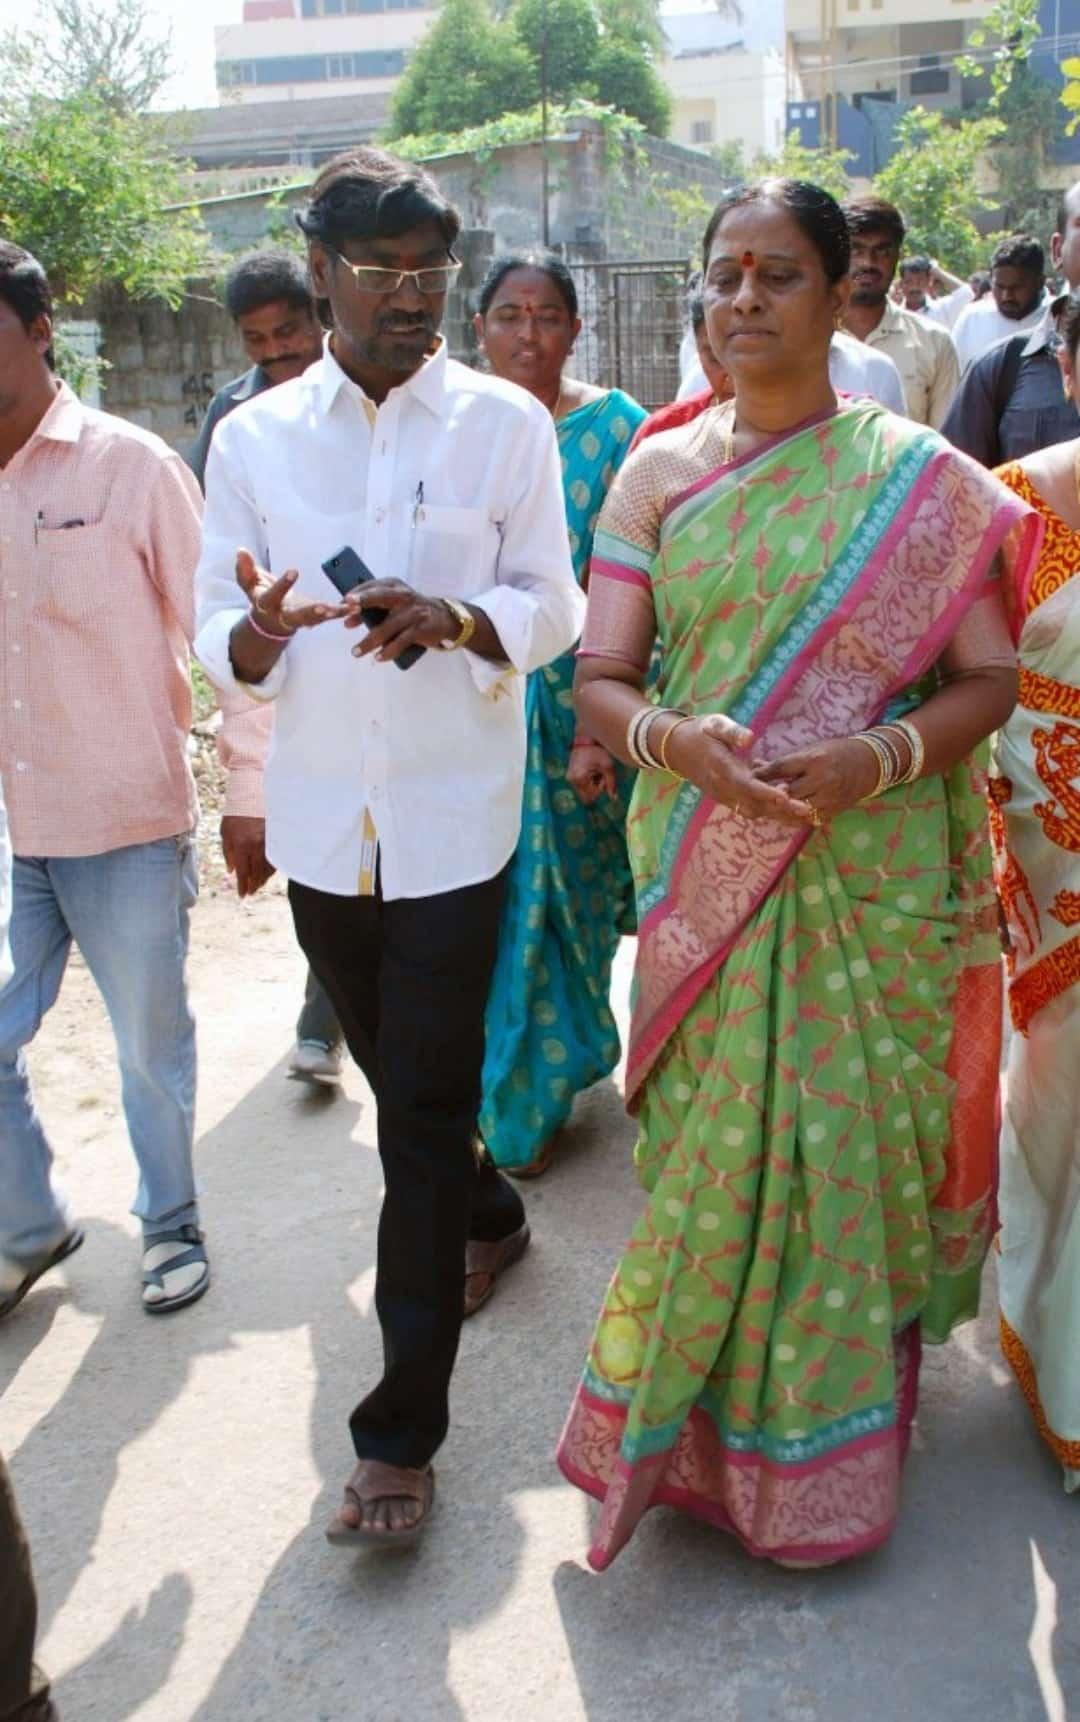 Chippa Venkateswarlu Netha | President of TPCC Handloom Cell | Congress | Spokesperson of Congress Party | Active Leader | East Constituency Incharge | Social Activist | Kothawada | Warangal | Telangana | theLeadersPage